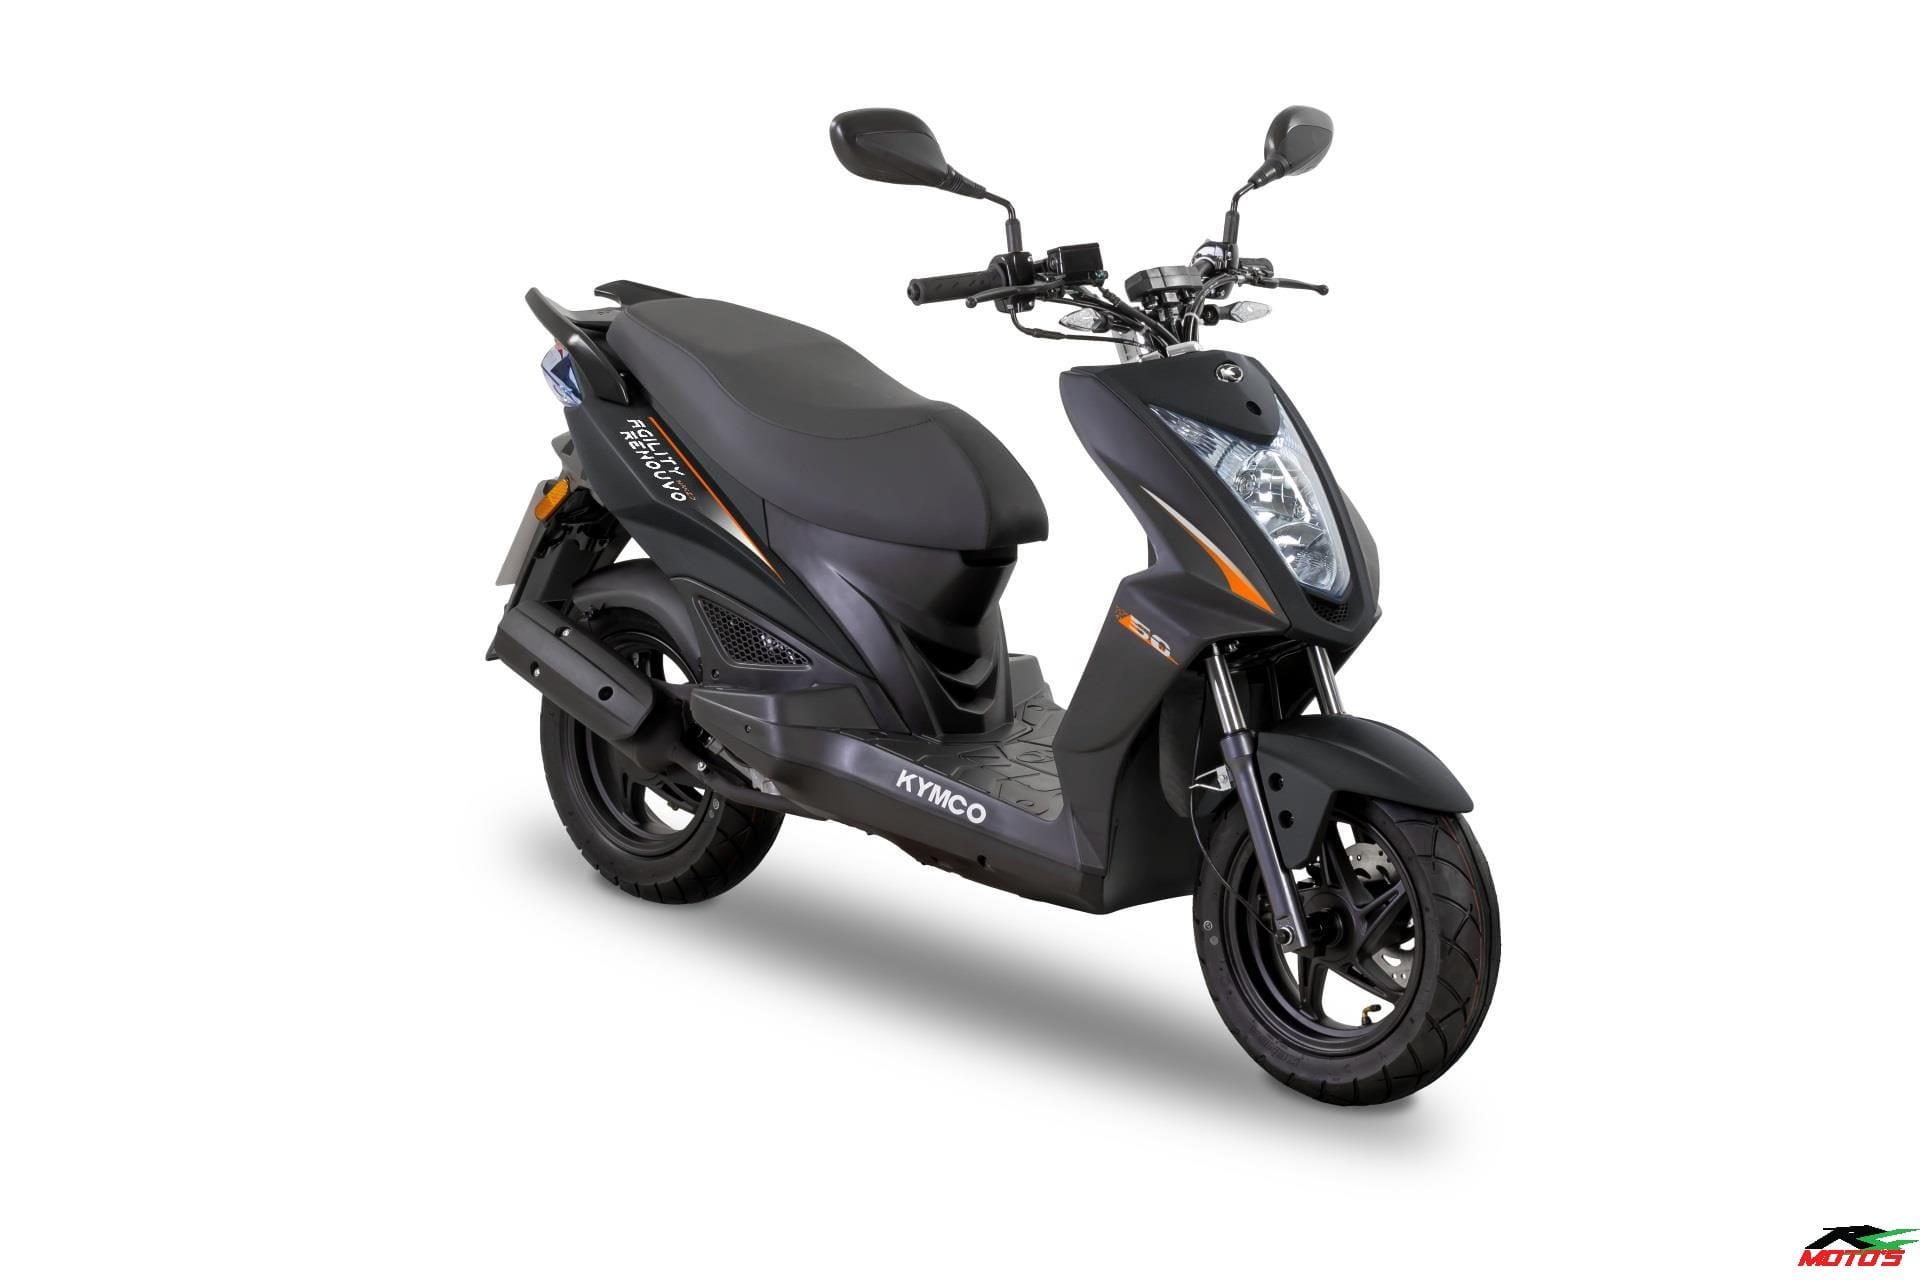 Kymco Renouvo - R4 Moto's